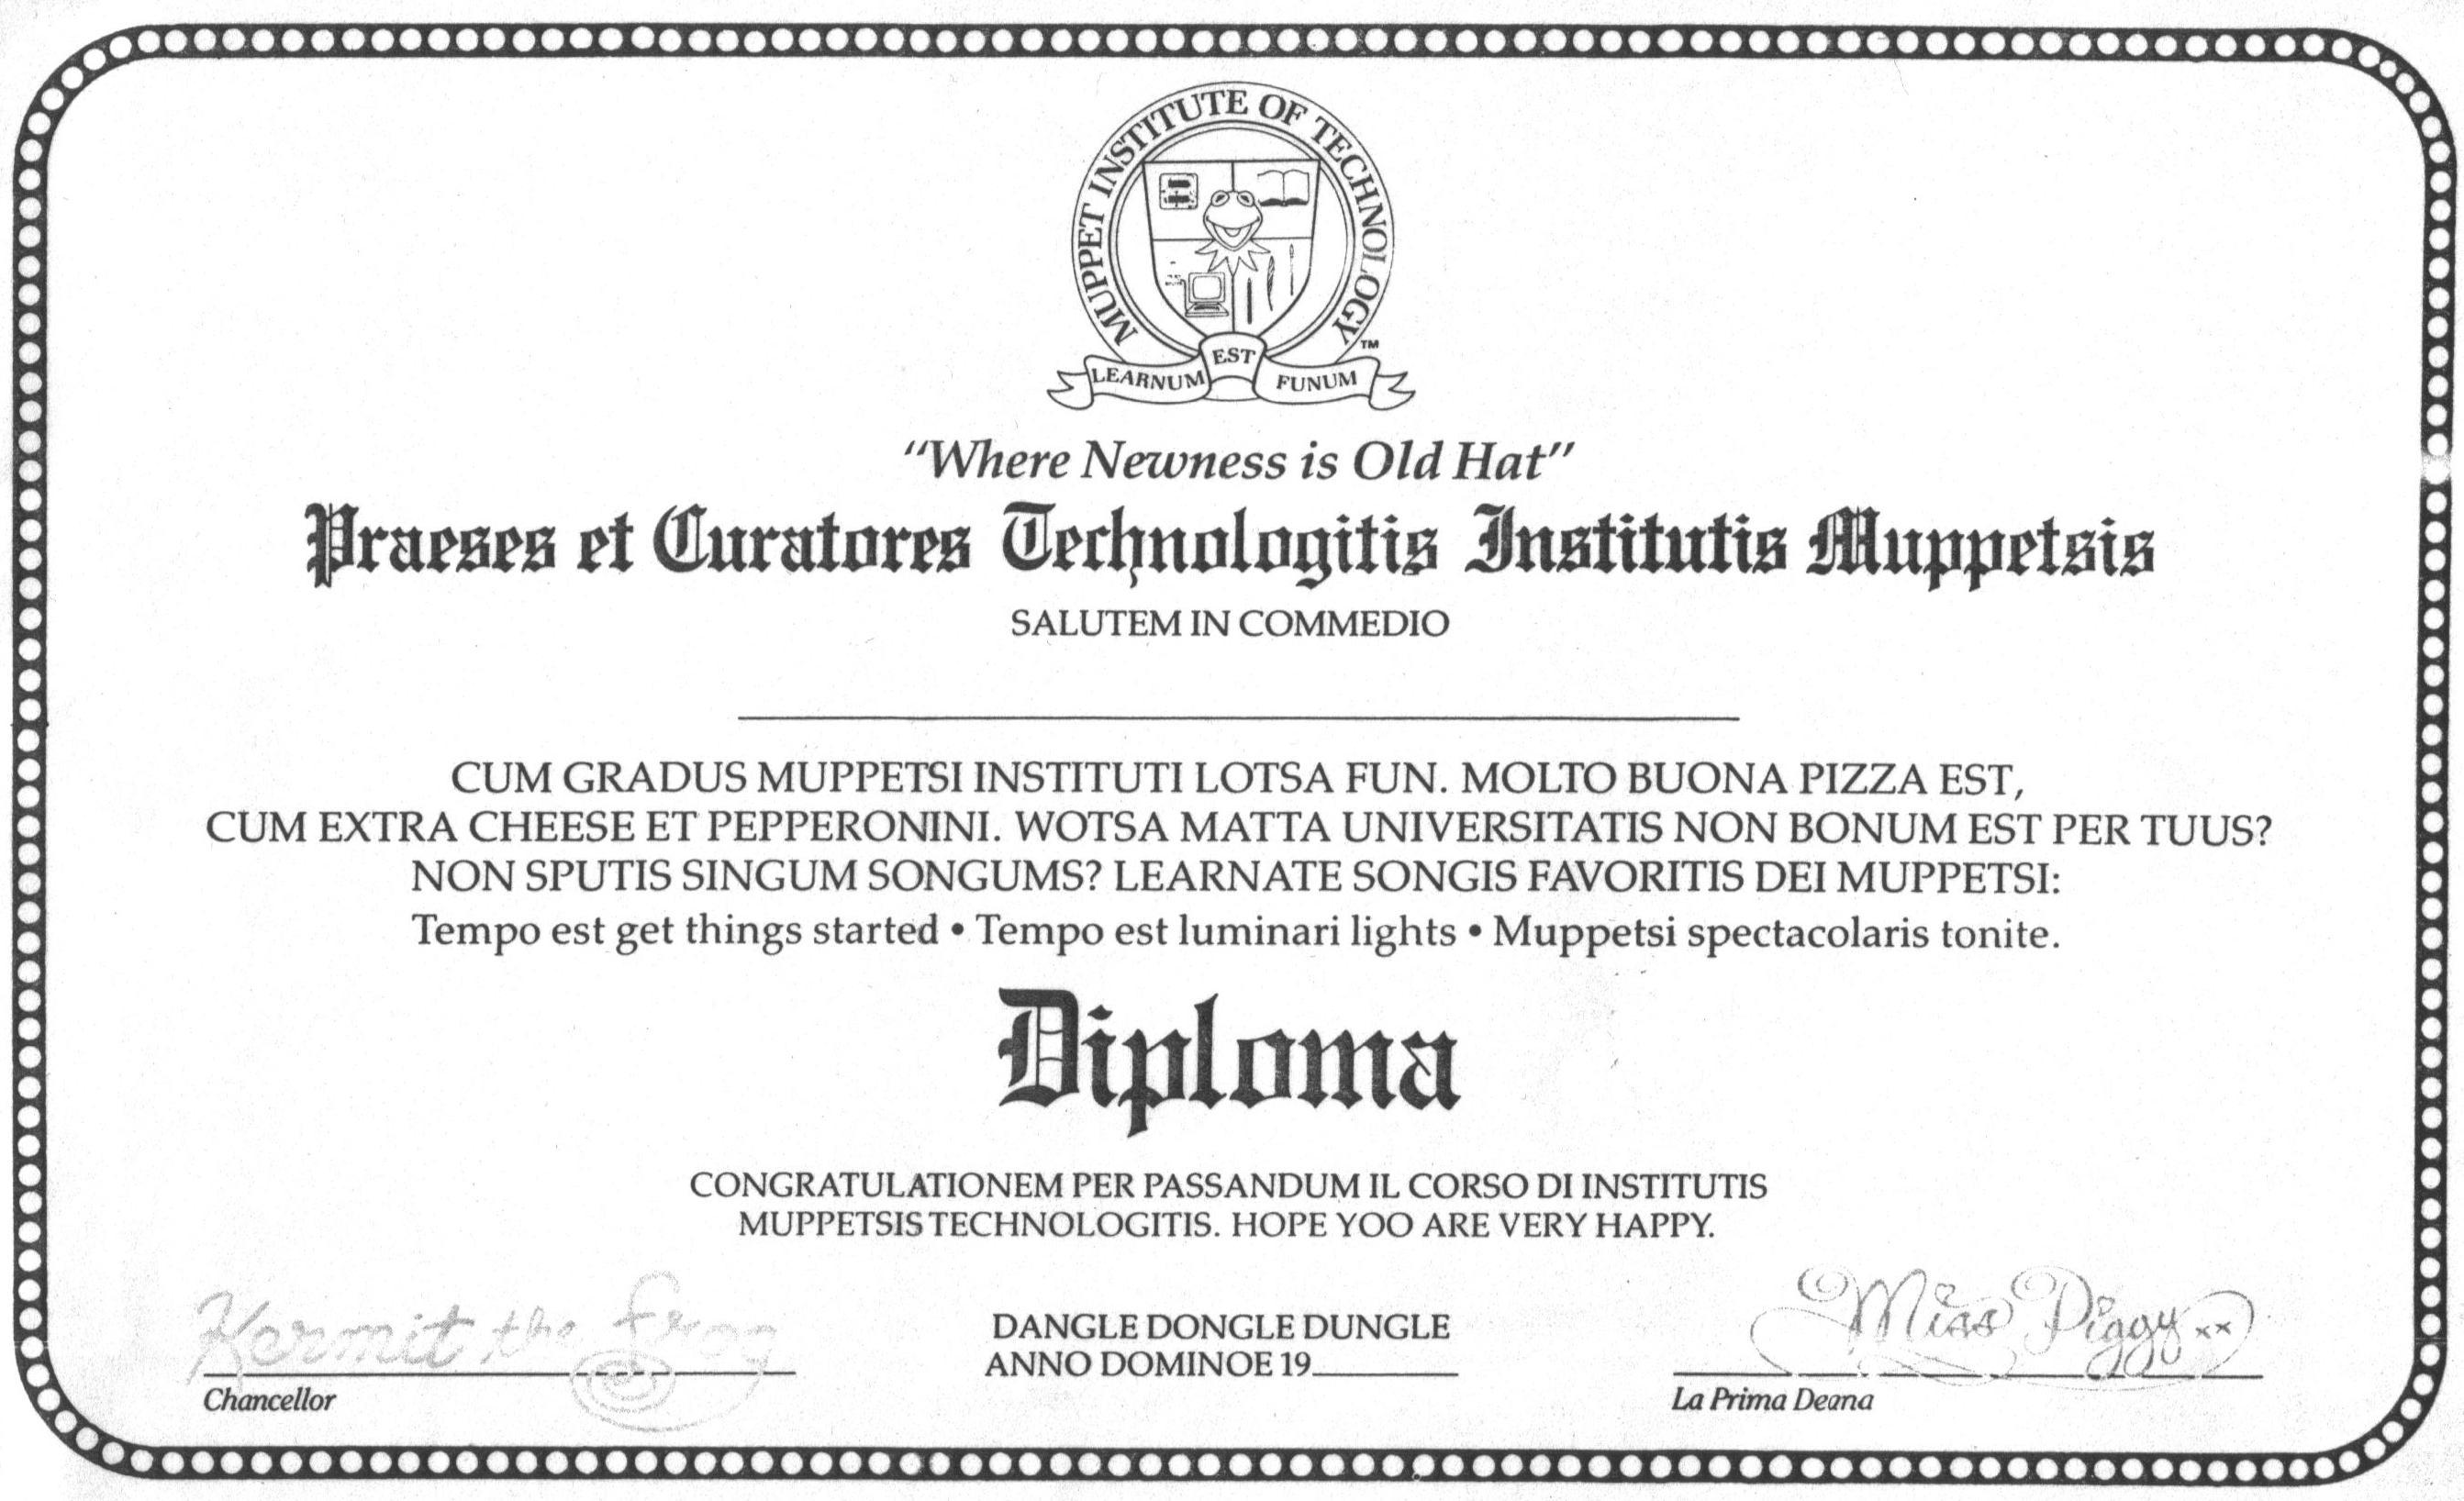 Jeffrey Jonas: certifications, degrees, diplomas, honors